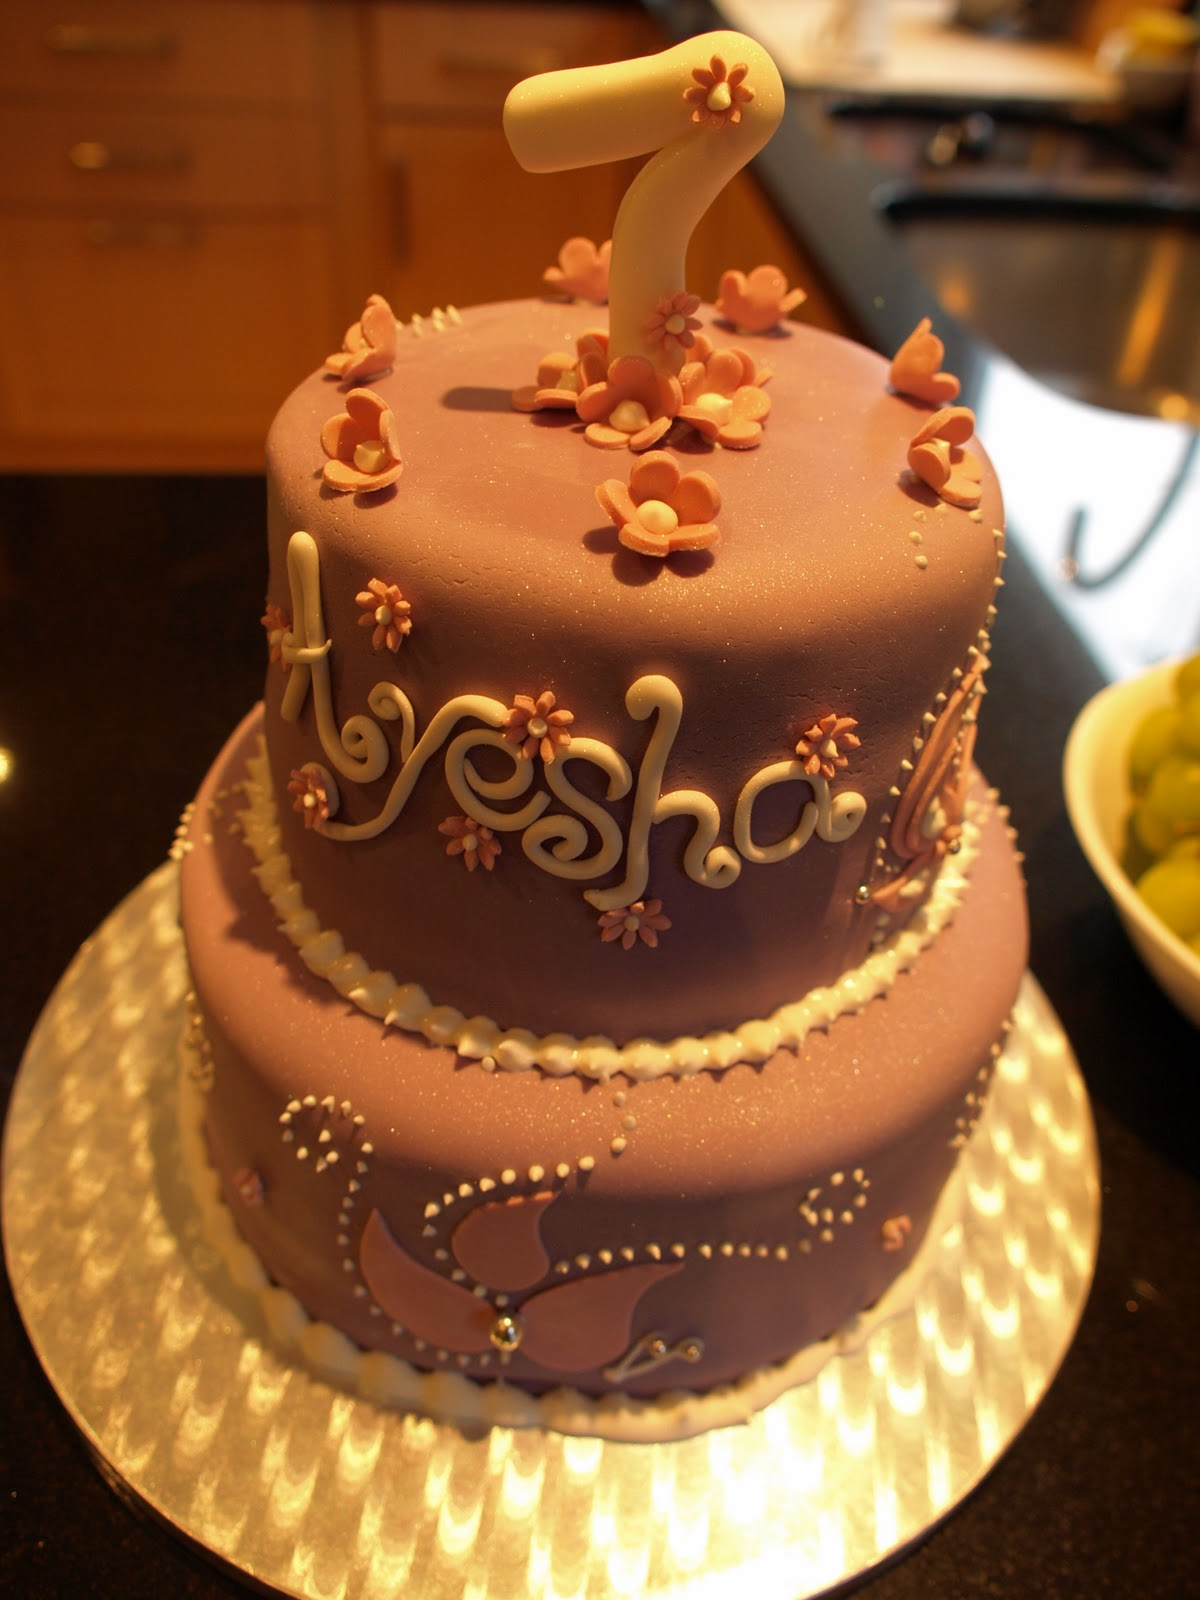 Birthday Cake Pics With Name Ayesha : CakeMasters UK: Ayesha s birthday cake